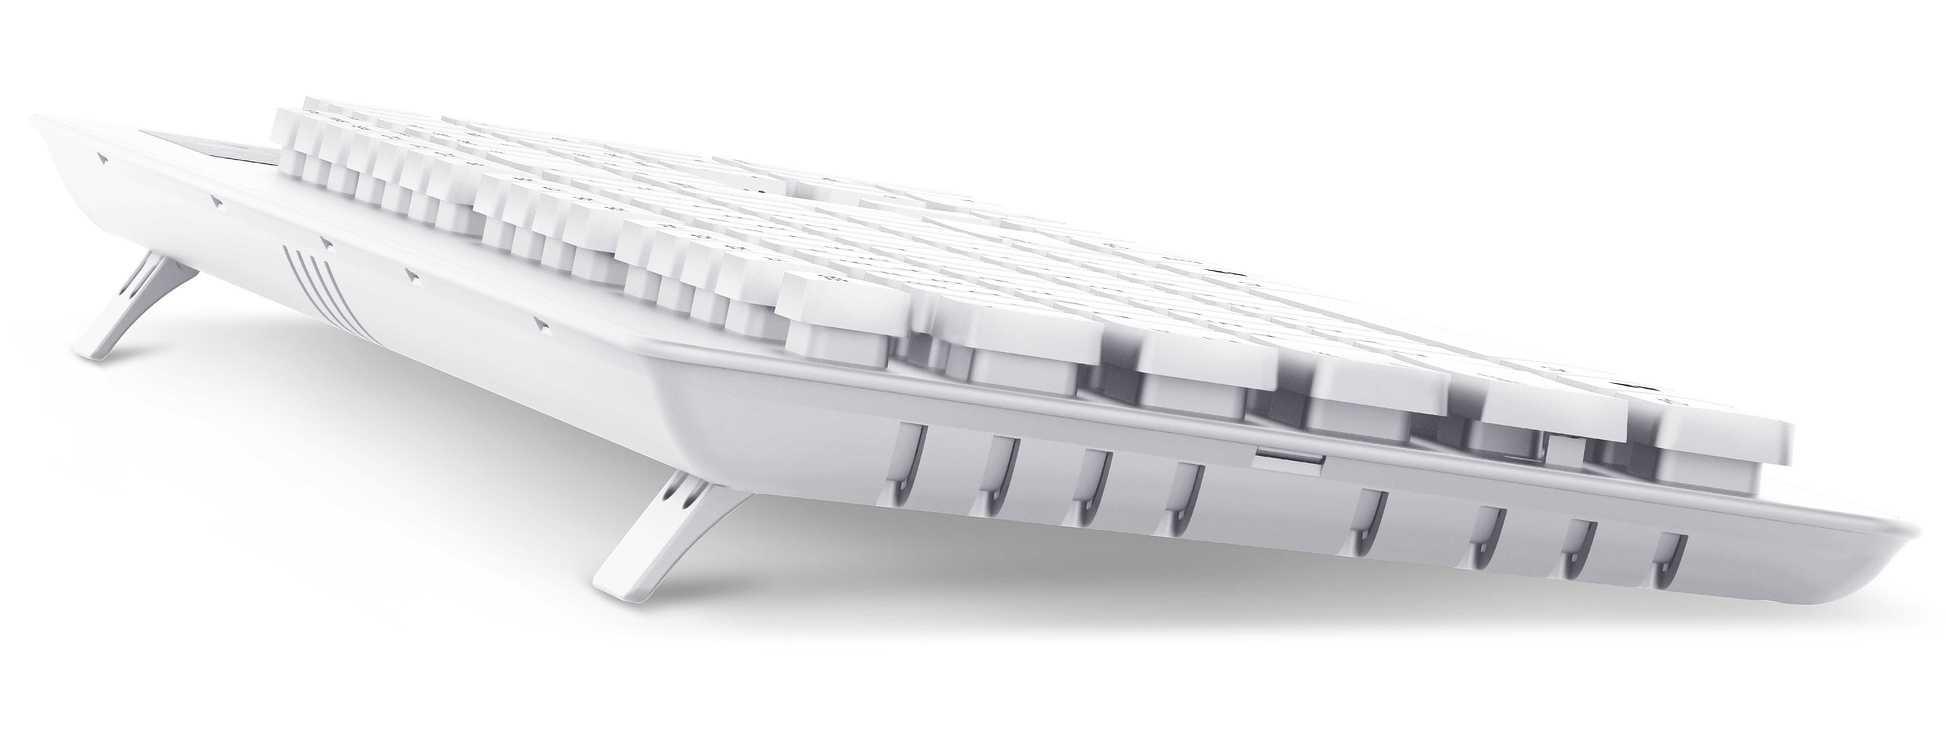 CLAVIER SLIMSTAR 130 FILAIRE PLAT USB BLANC PC slimstar130white-3